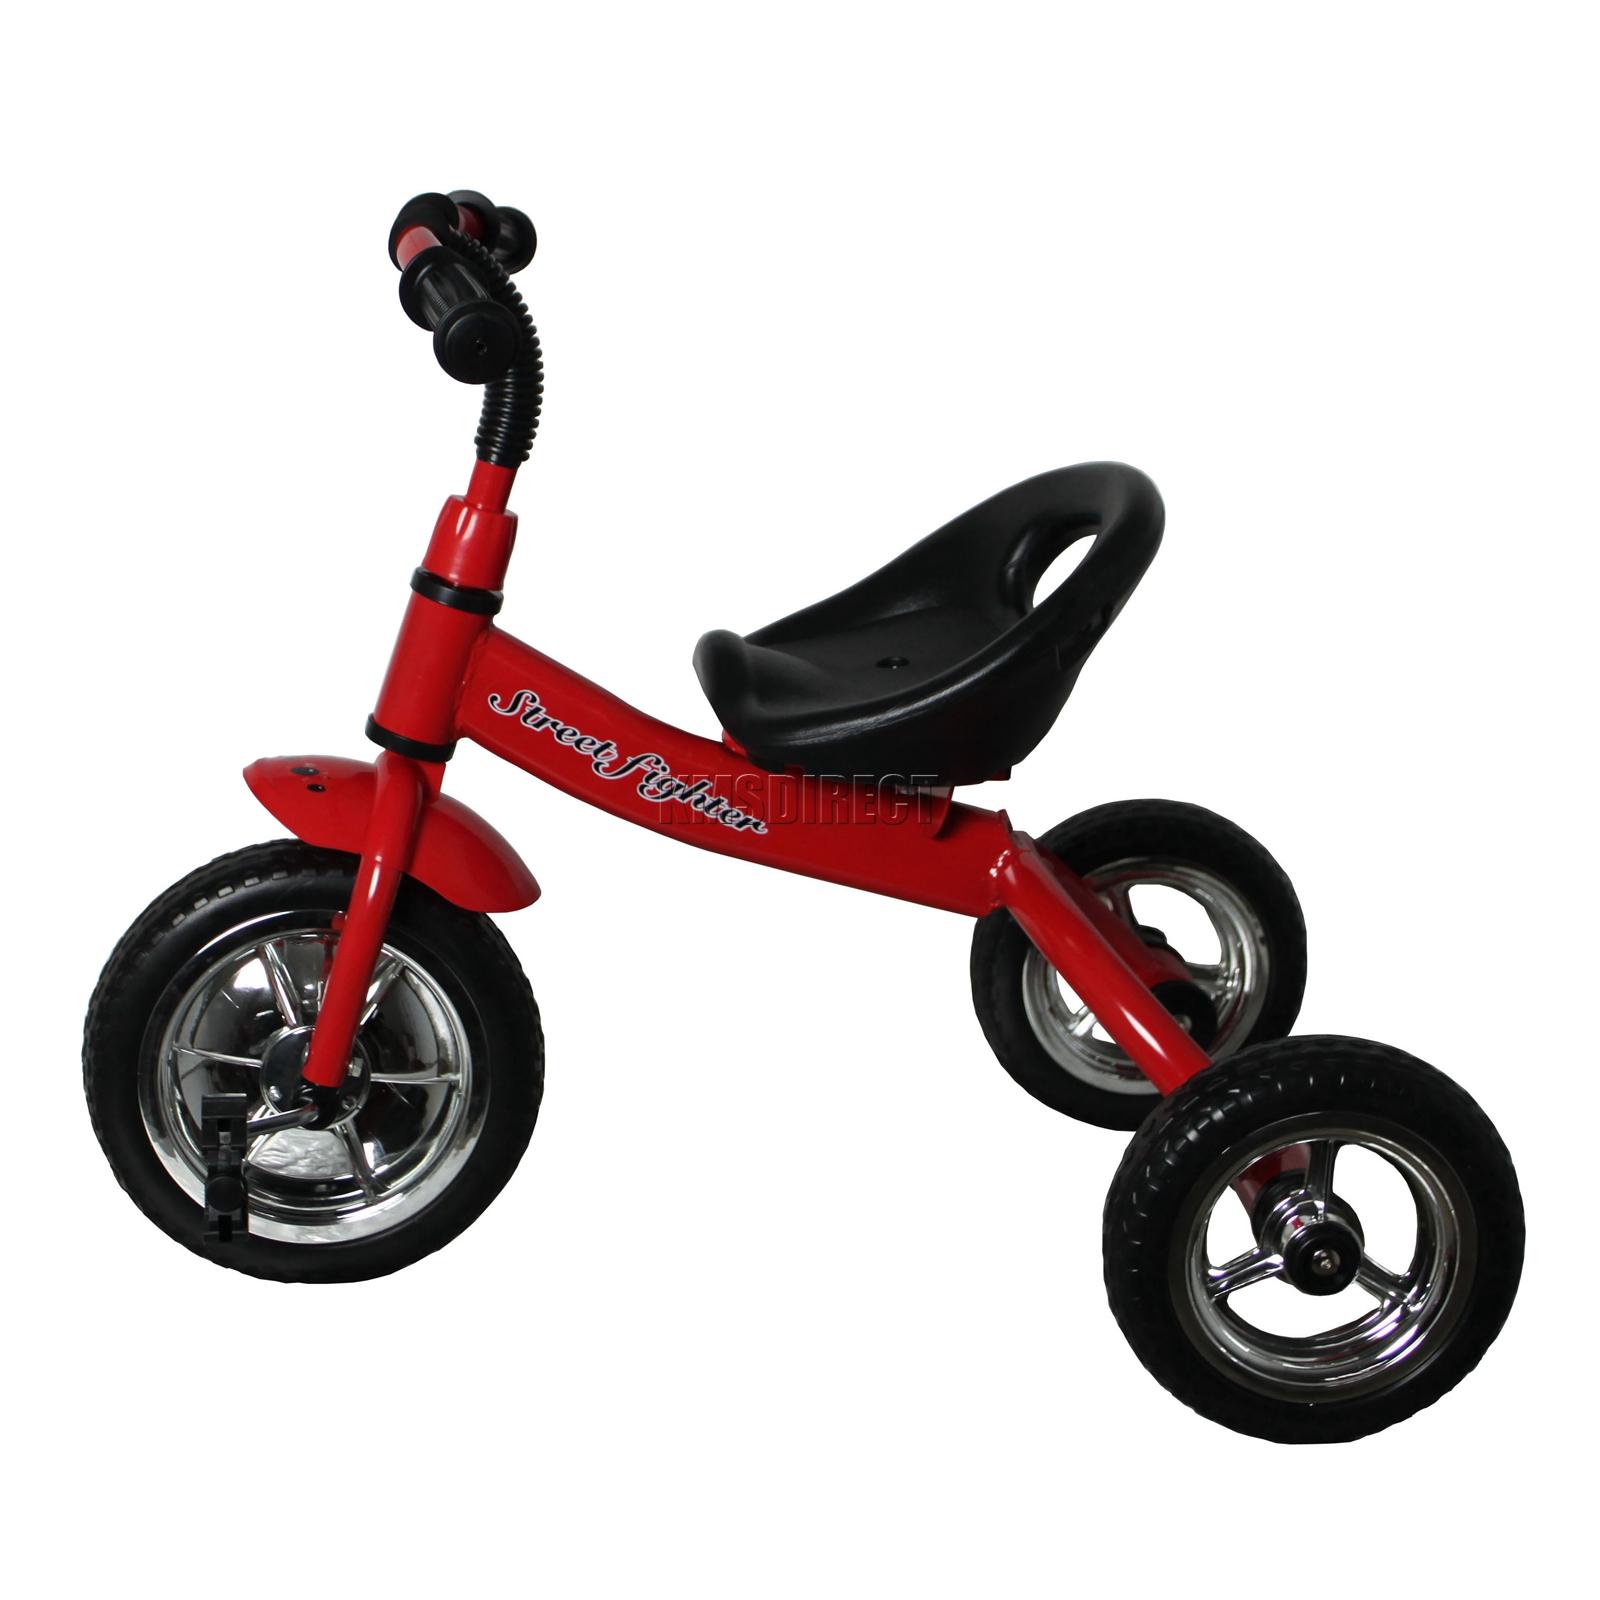 foxhunter red kids child children trike tricycle 3 wheeler. Black Bedroom Furniture Sets. Home Design Ideas